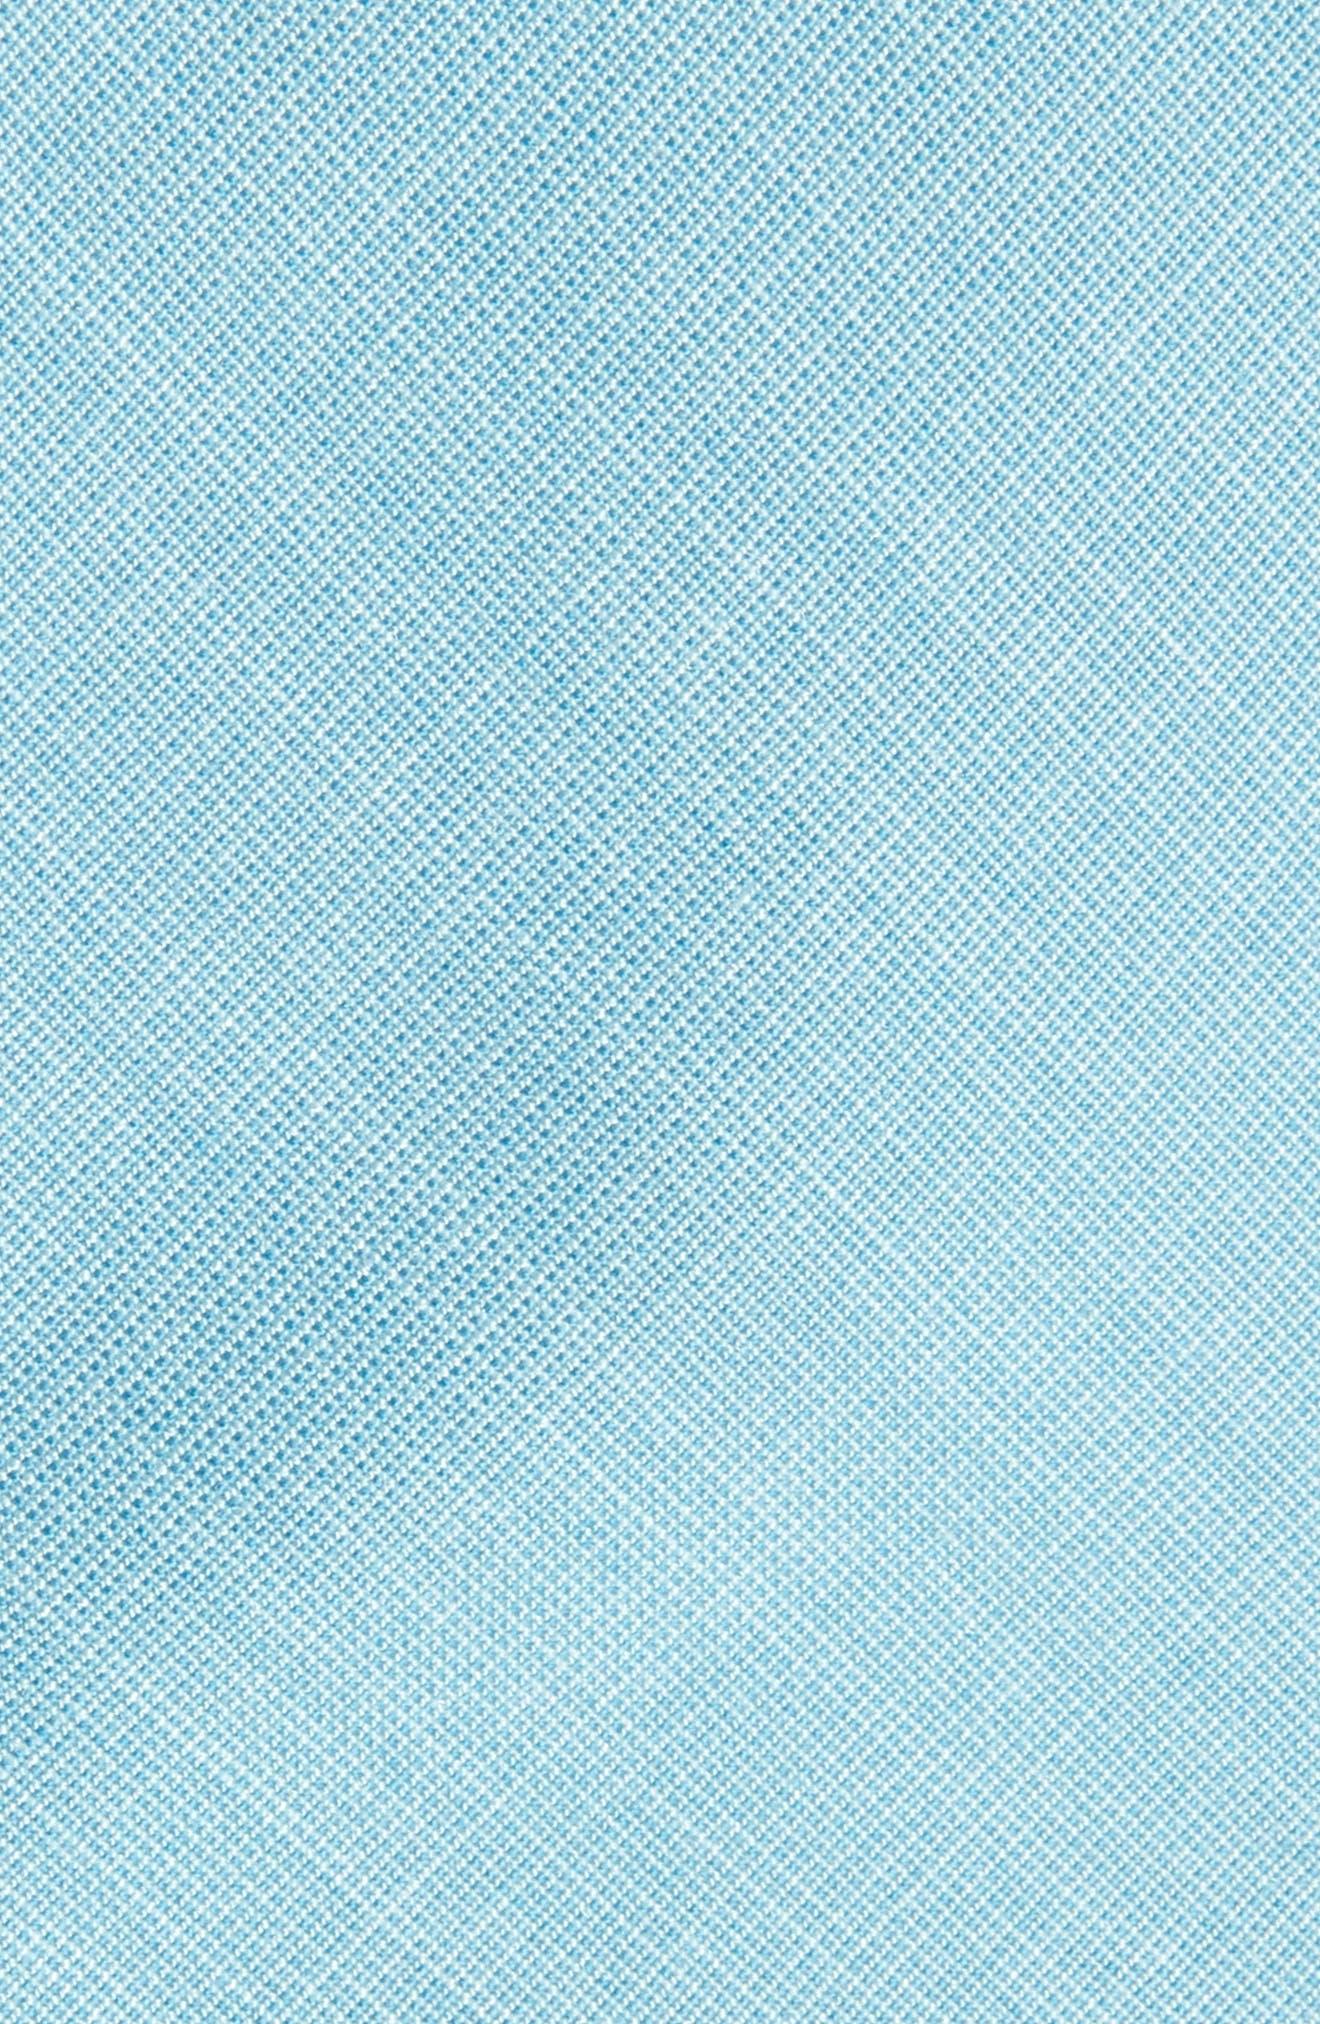 Alternate Image 2  - Nordstrom Men's Shop Jeffry Solid Skinny Tie